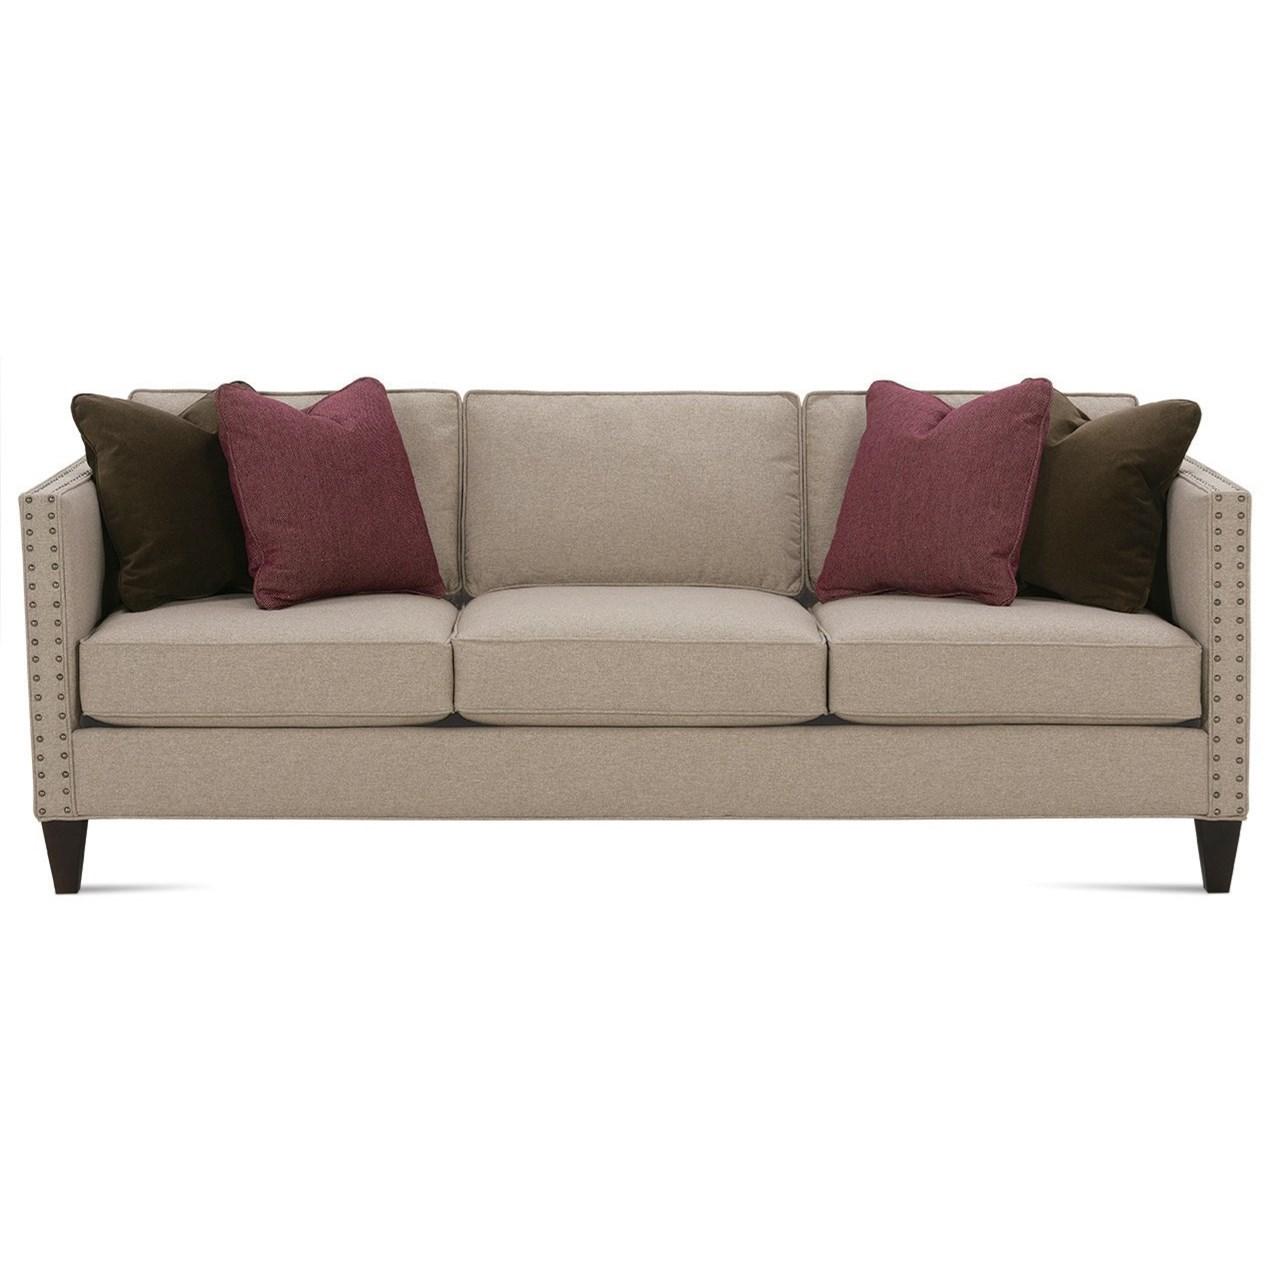 Mitchell - RXO <b>Custom</b> Queen Sleeper by Rowe at Baer's Furniture